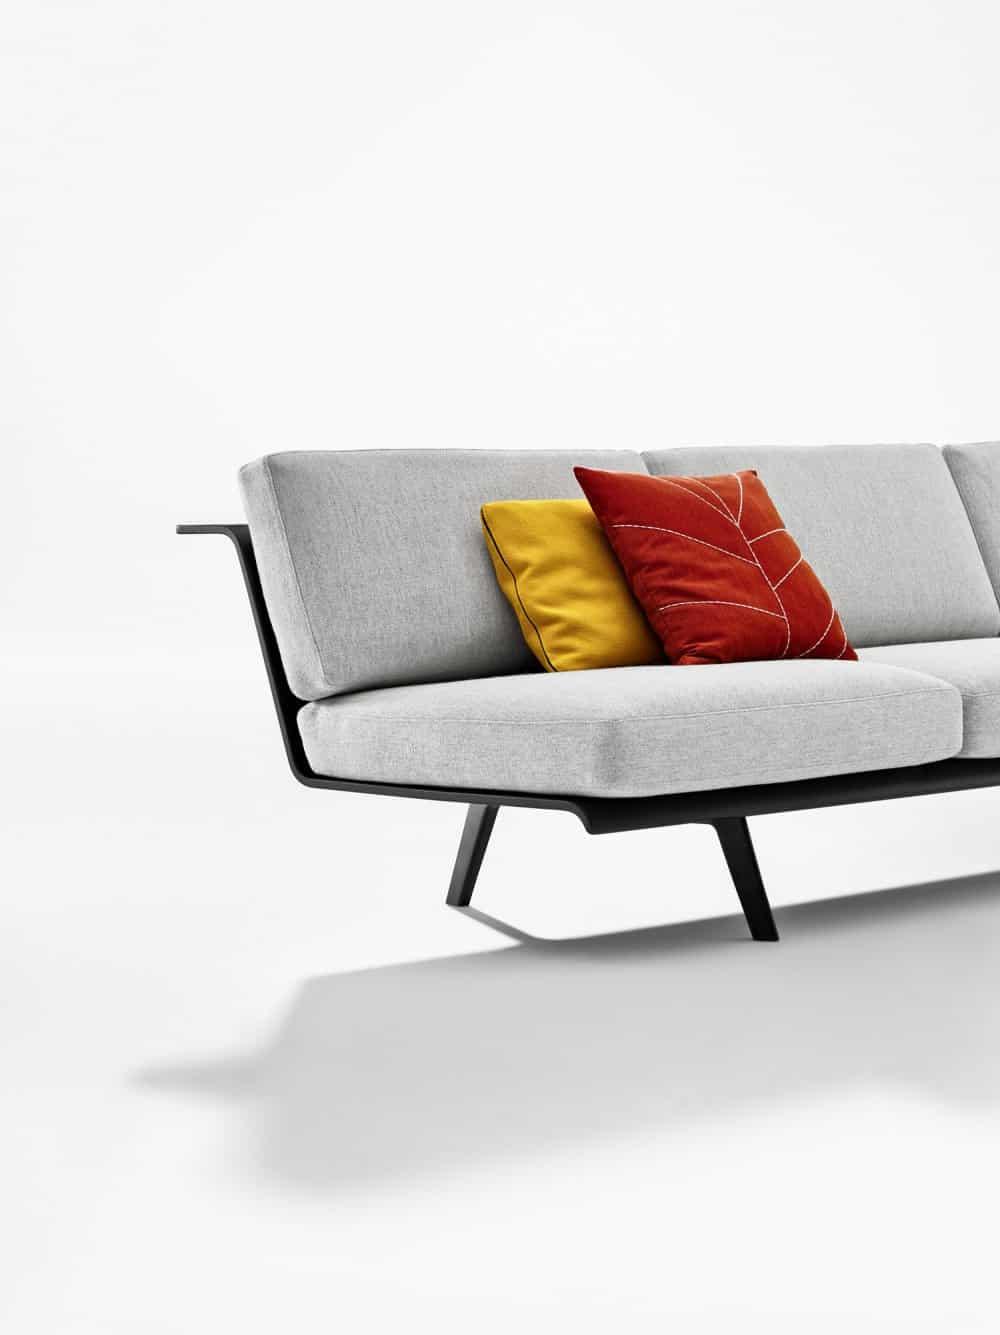 View In Gallery Versatile Modular Sofa System Zinta From Arper 12